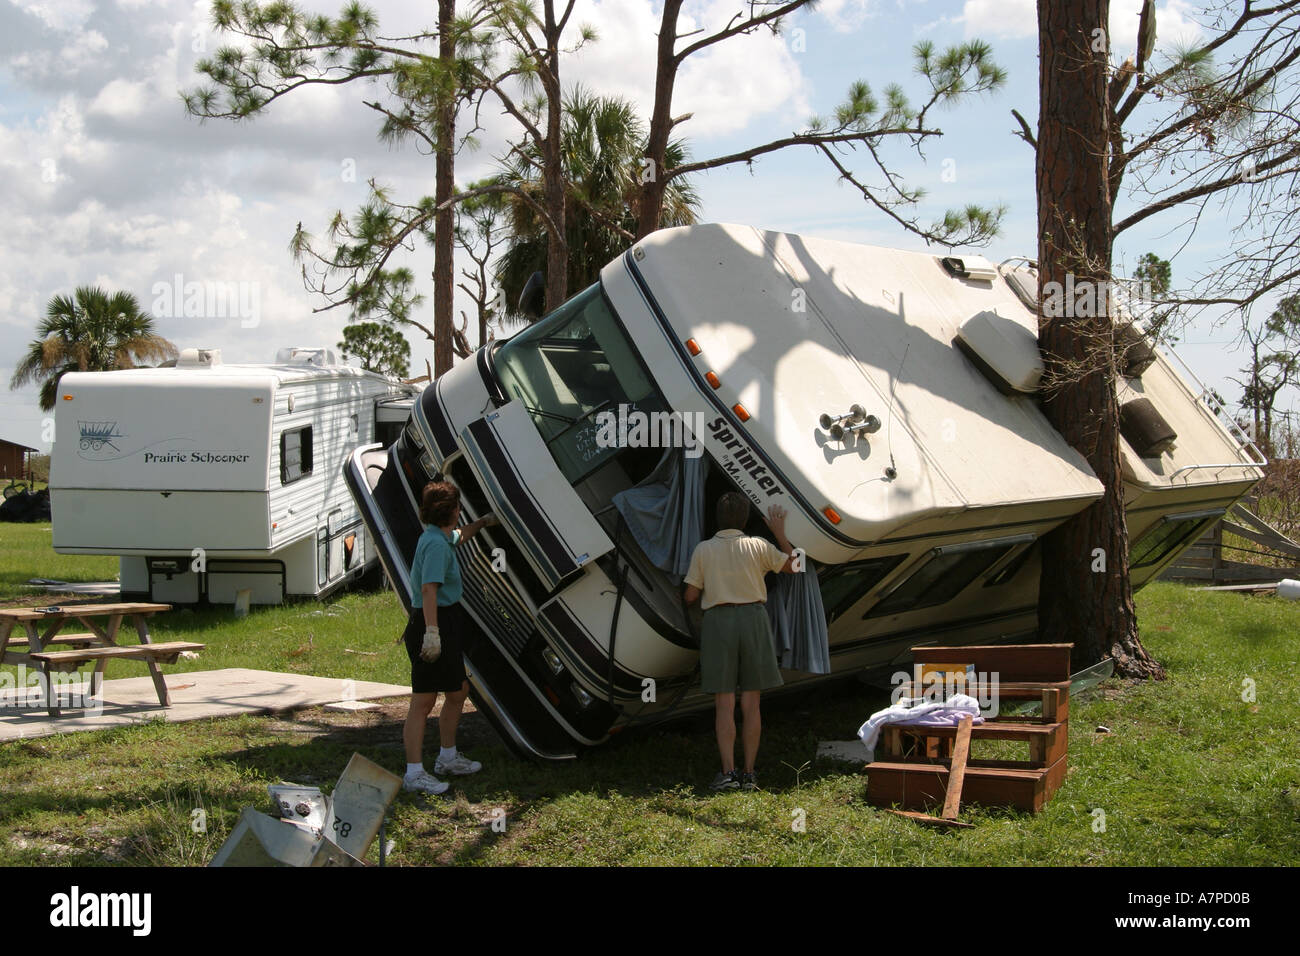 Florida Punta Gorda Mobile Home Modular Trailer Park Hurricane Charley Damage Destruction Victims